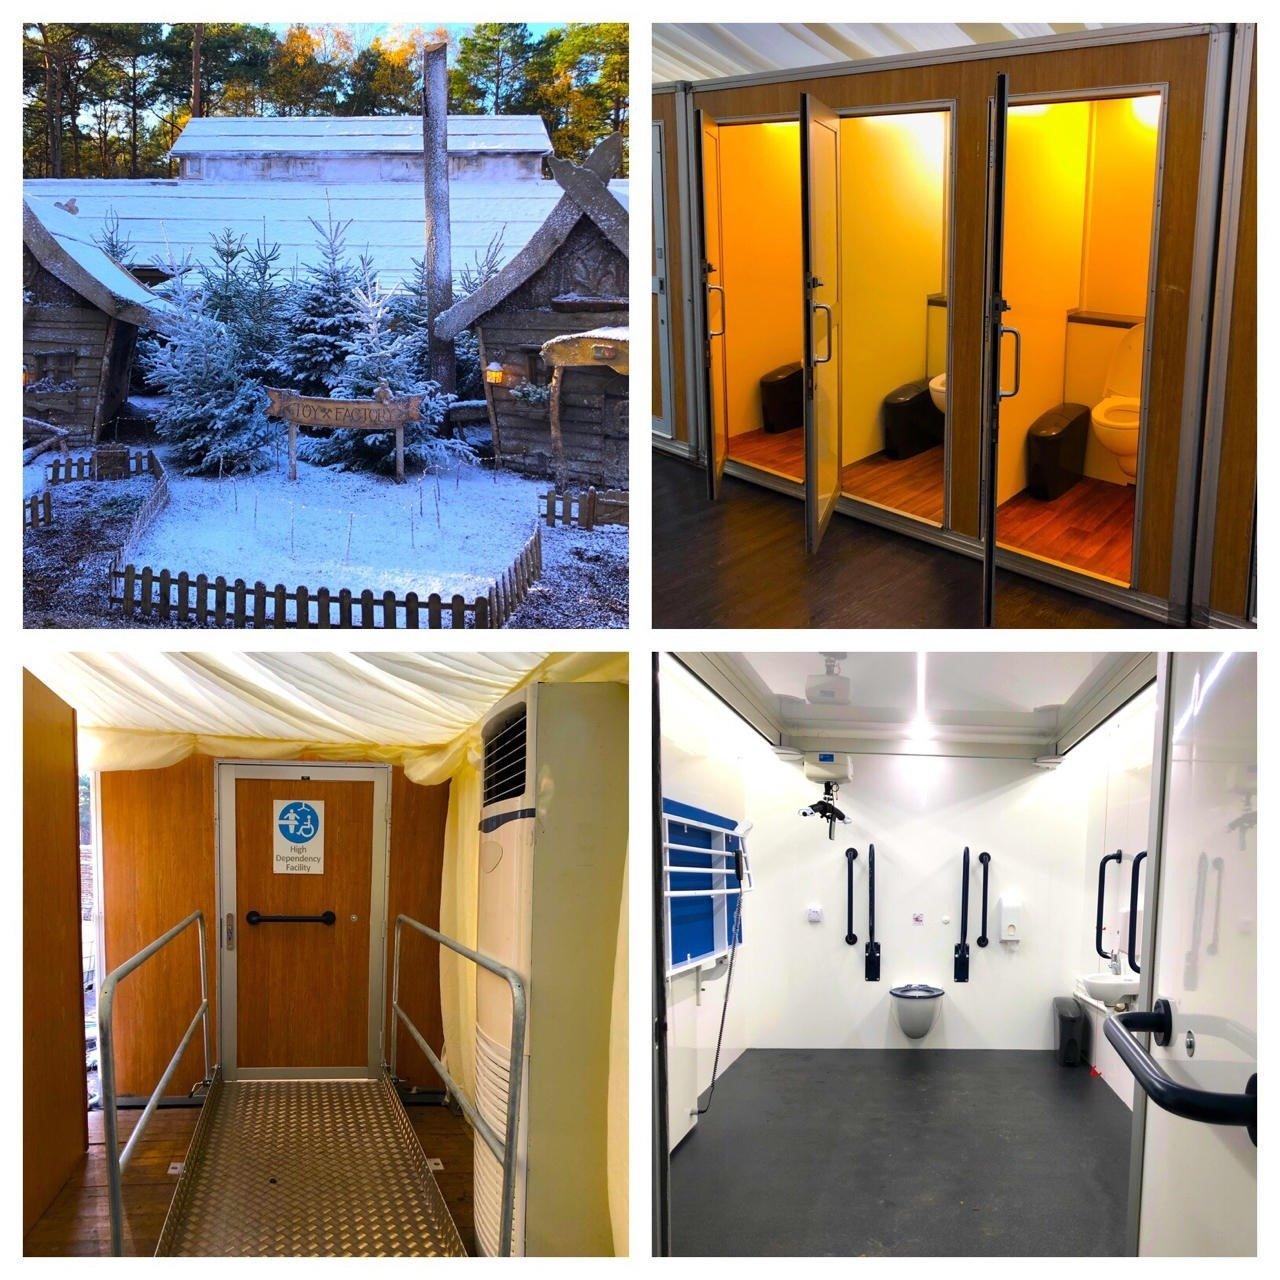 Lapland UK High Dependency Unit Rental Vacuum Toilet